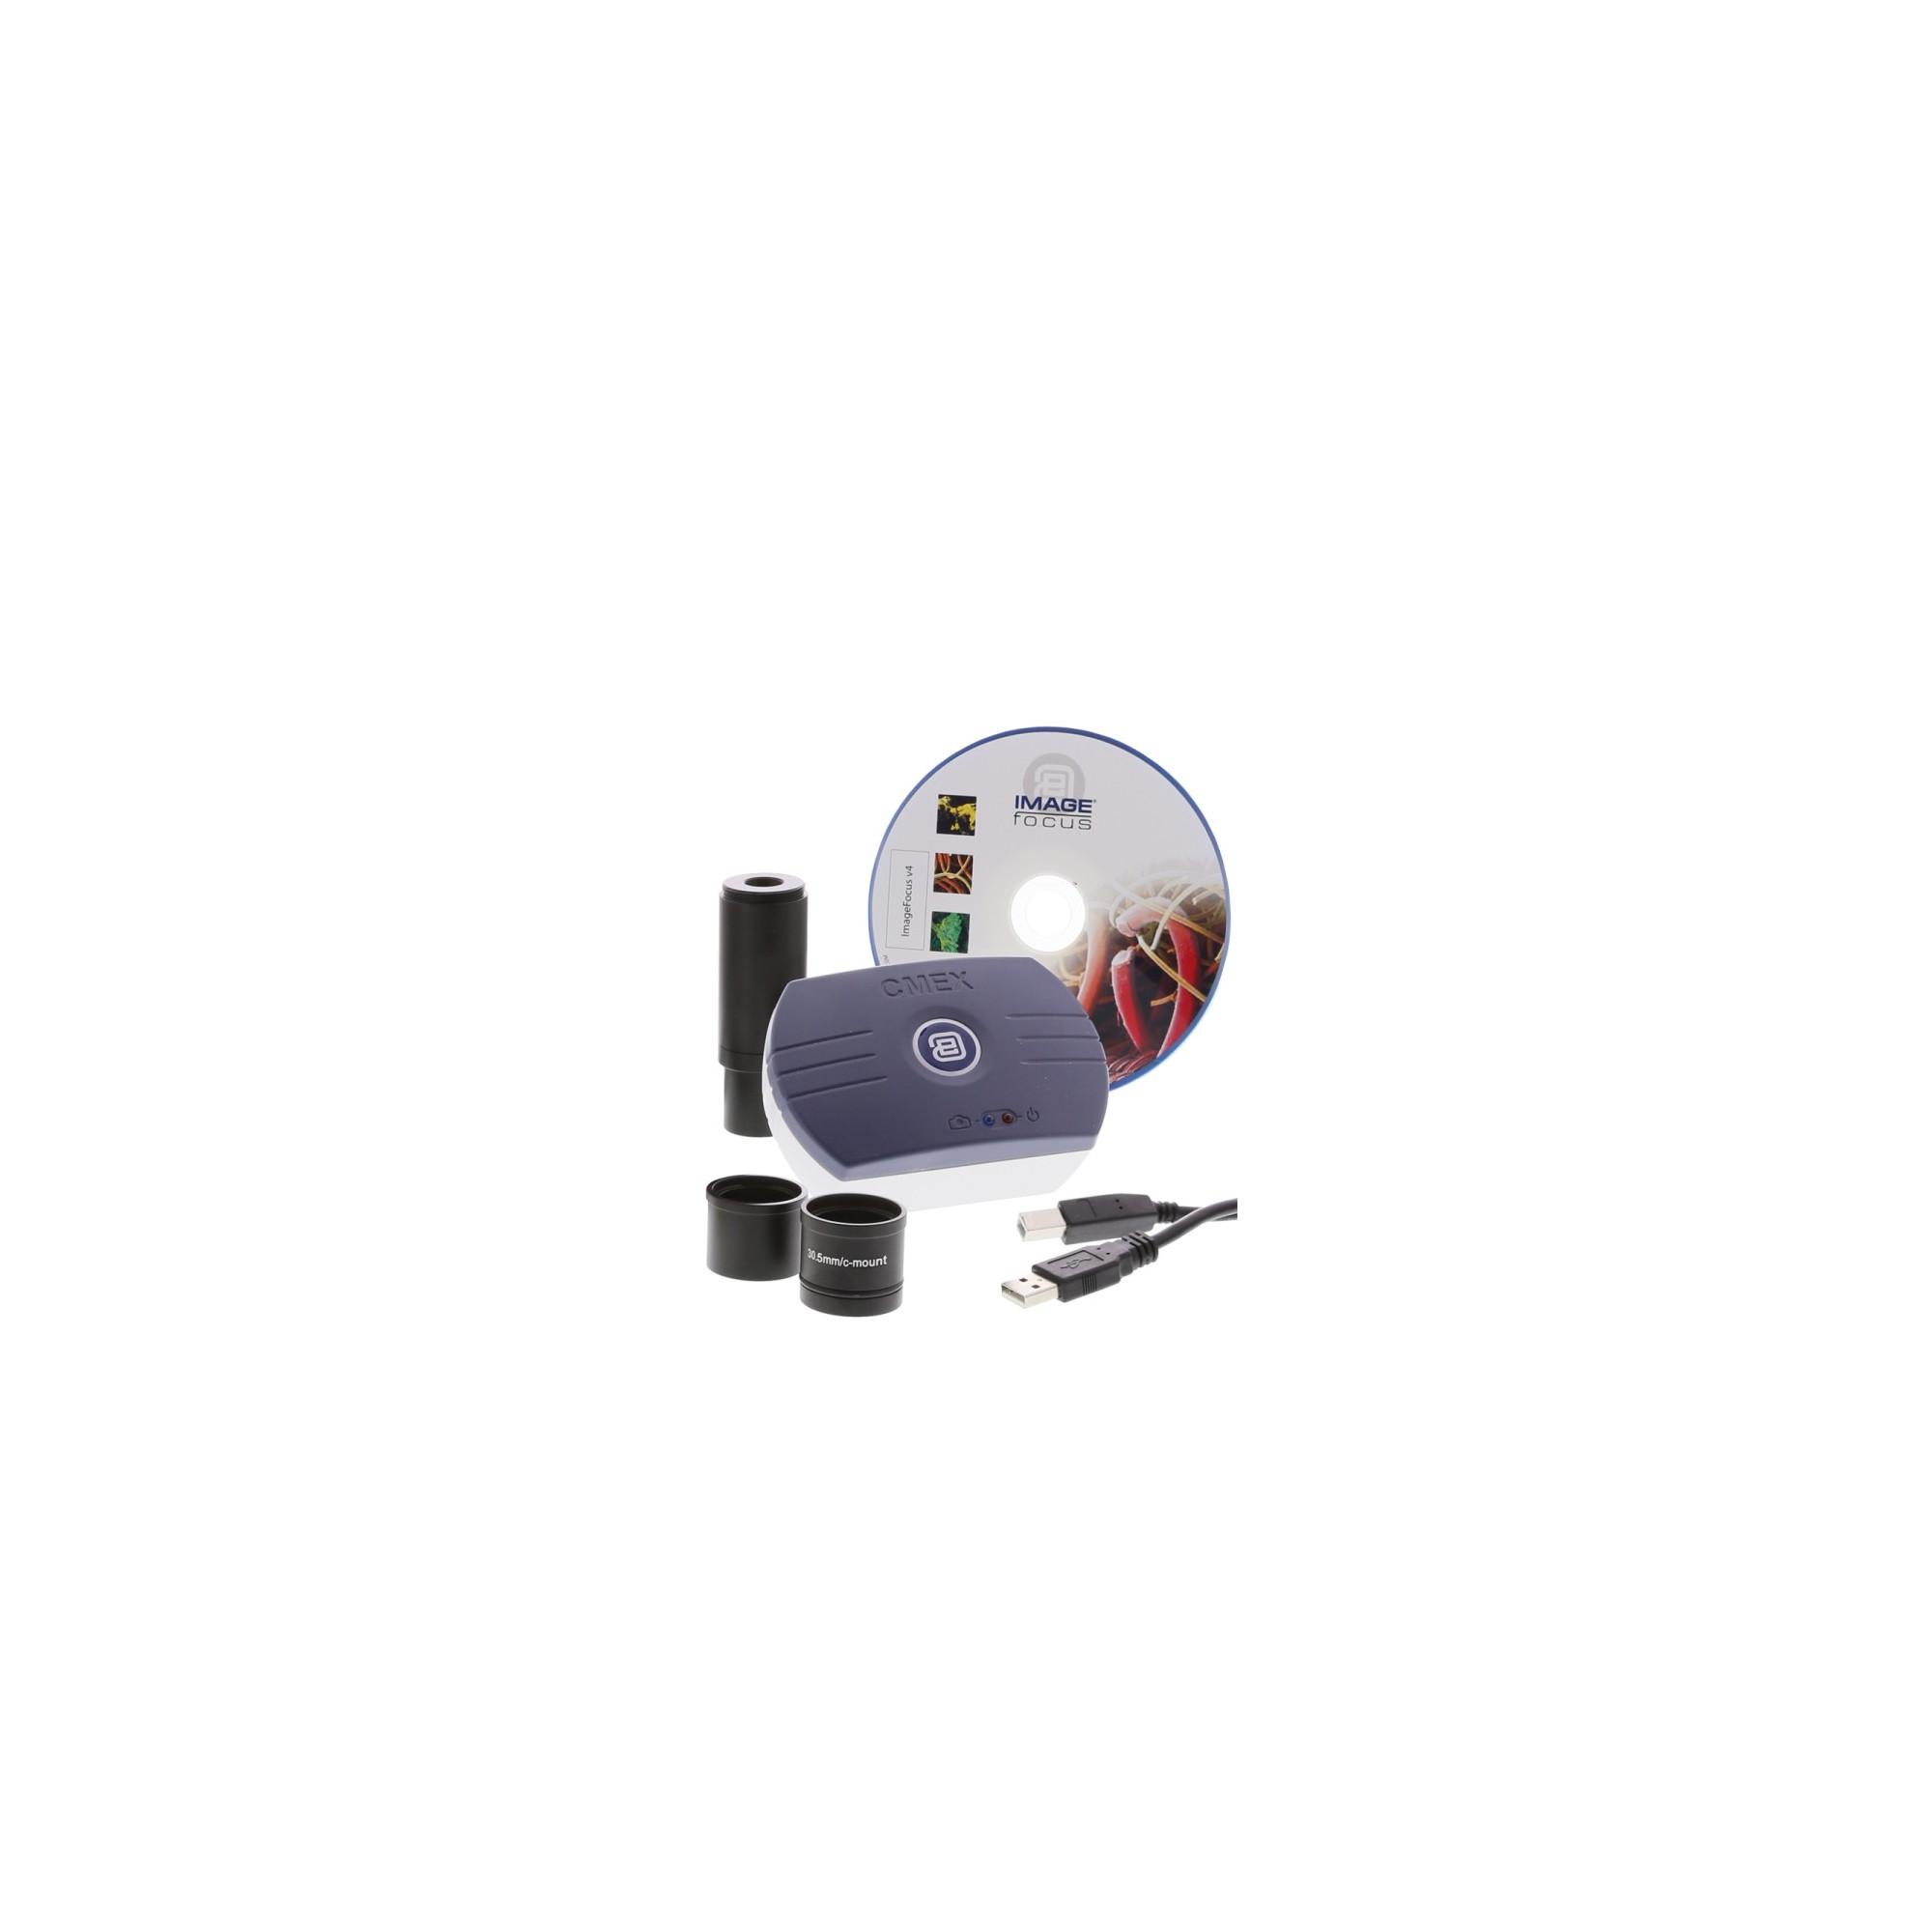 CÁMARA DIGITAL USB-2 MODELO CMEX-3 ( 3,0 MP)